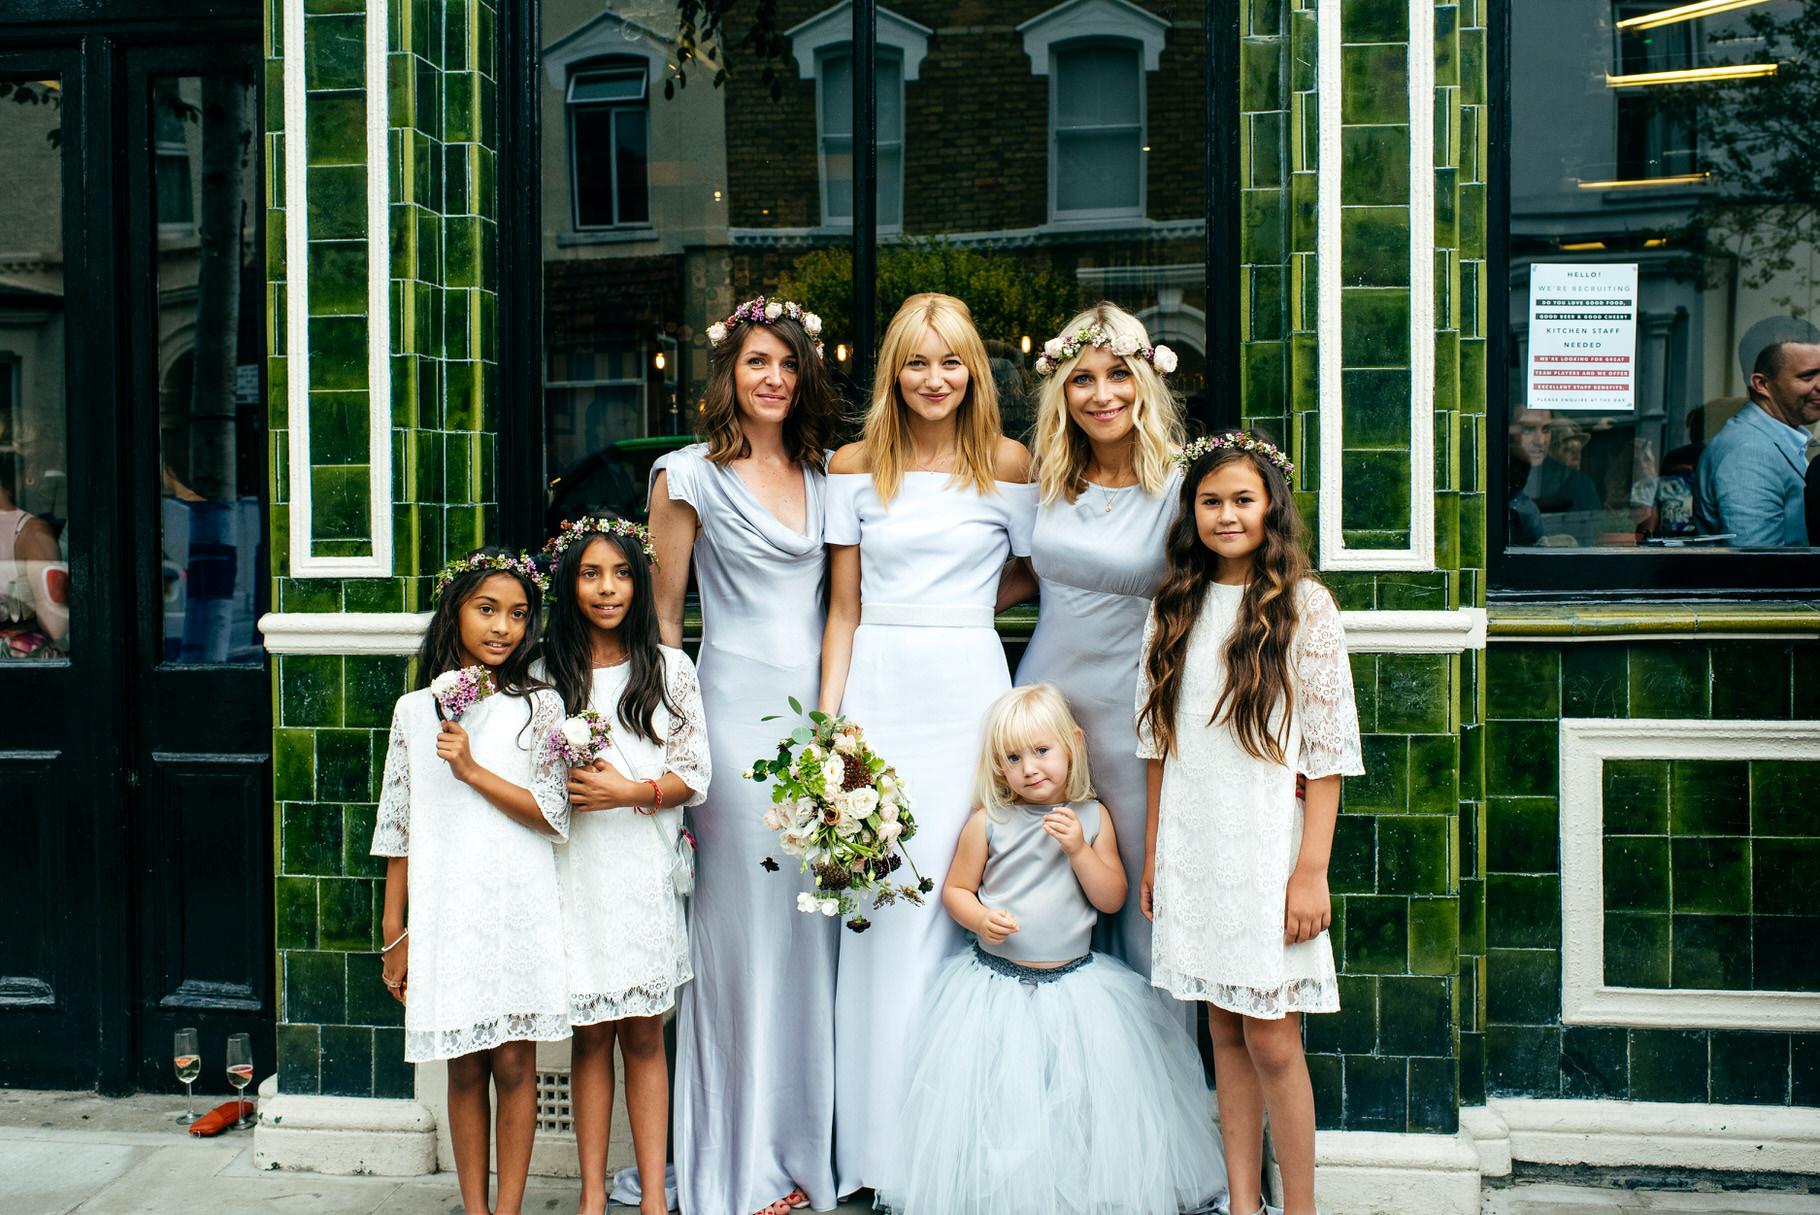 West Reservoir Centre Wedding Photos